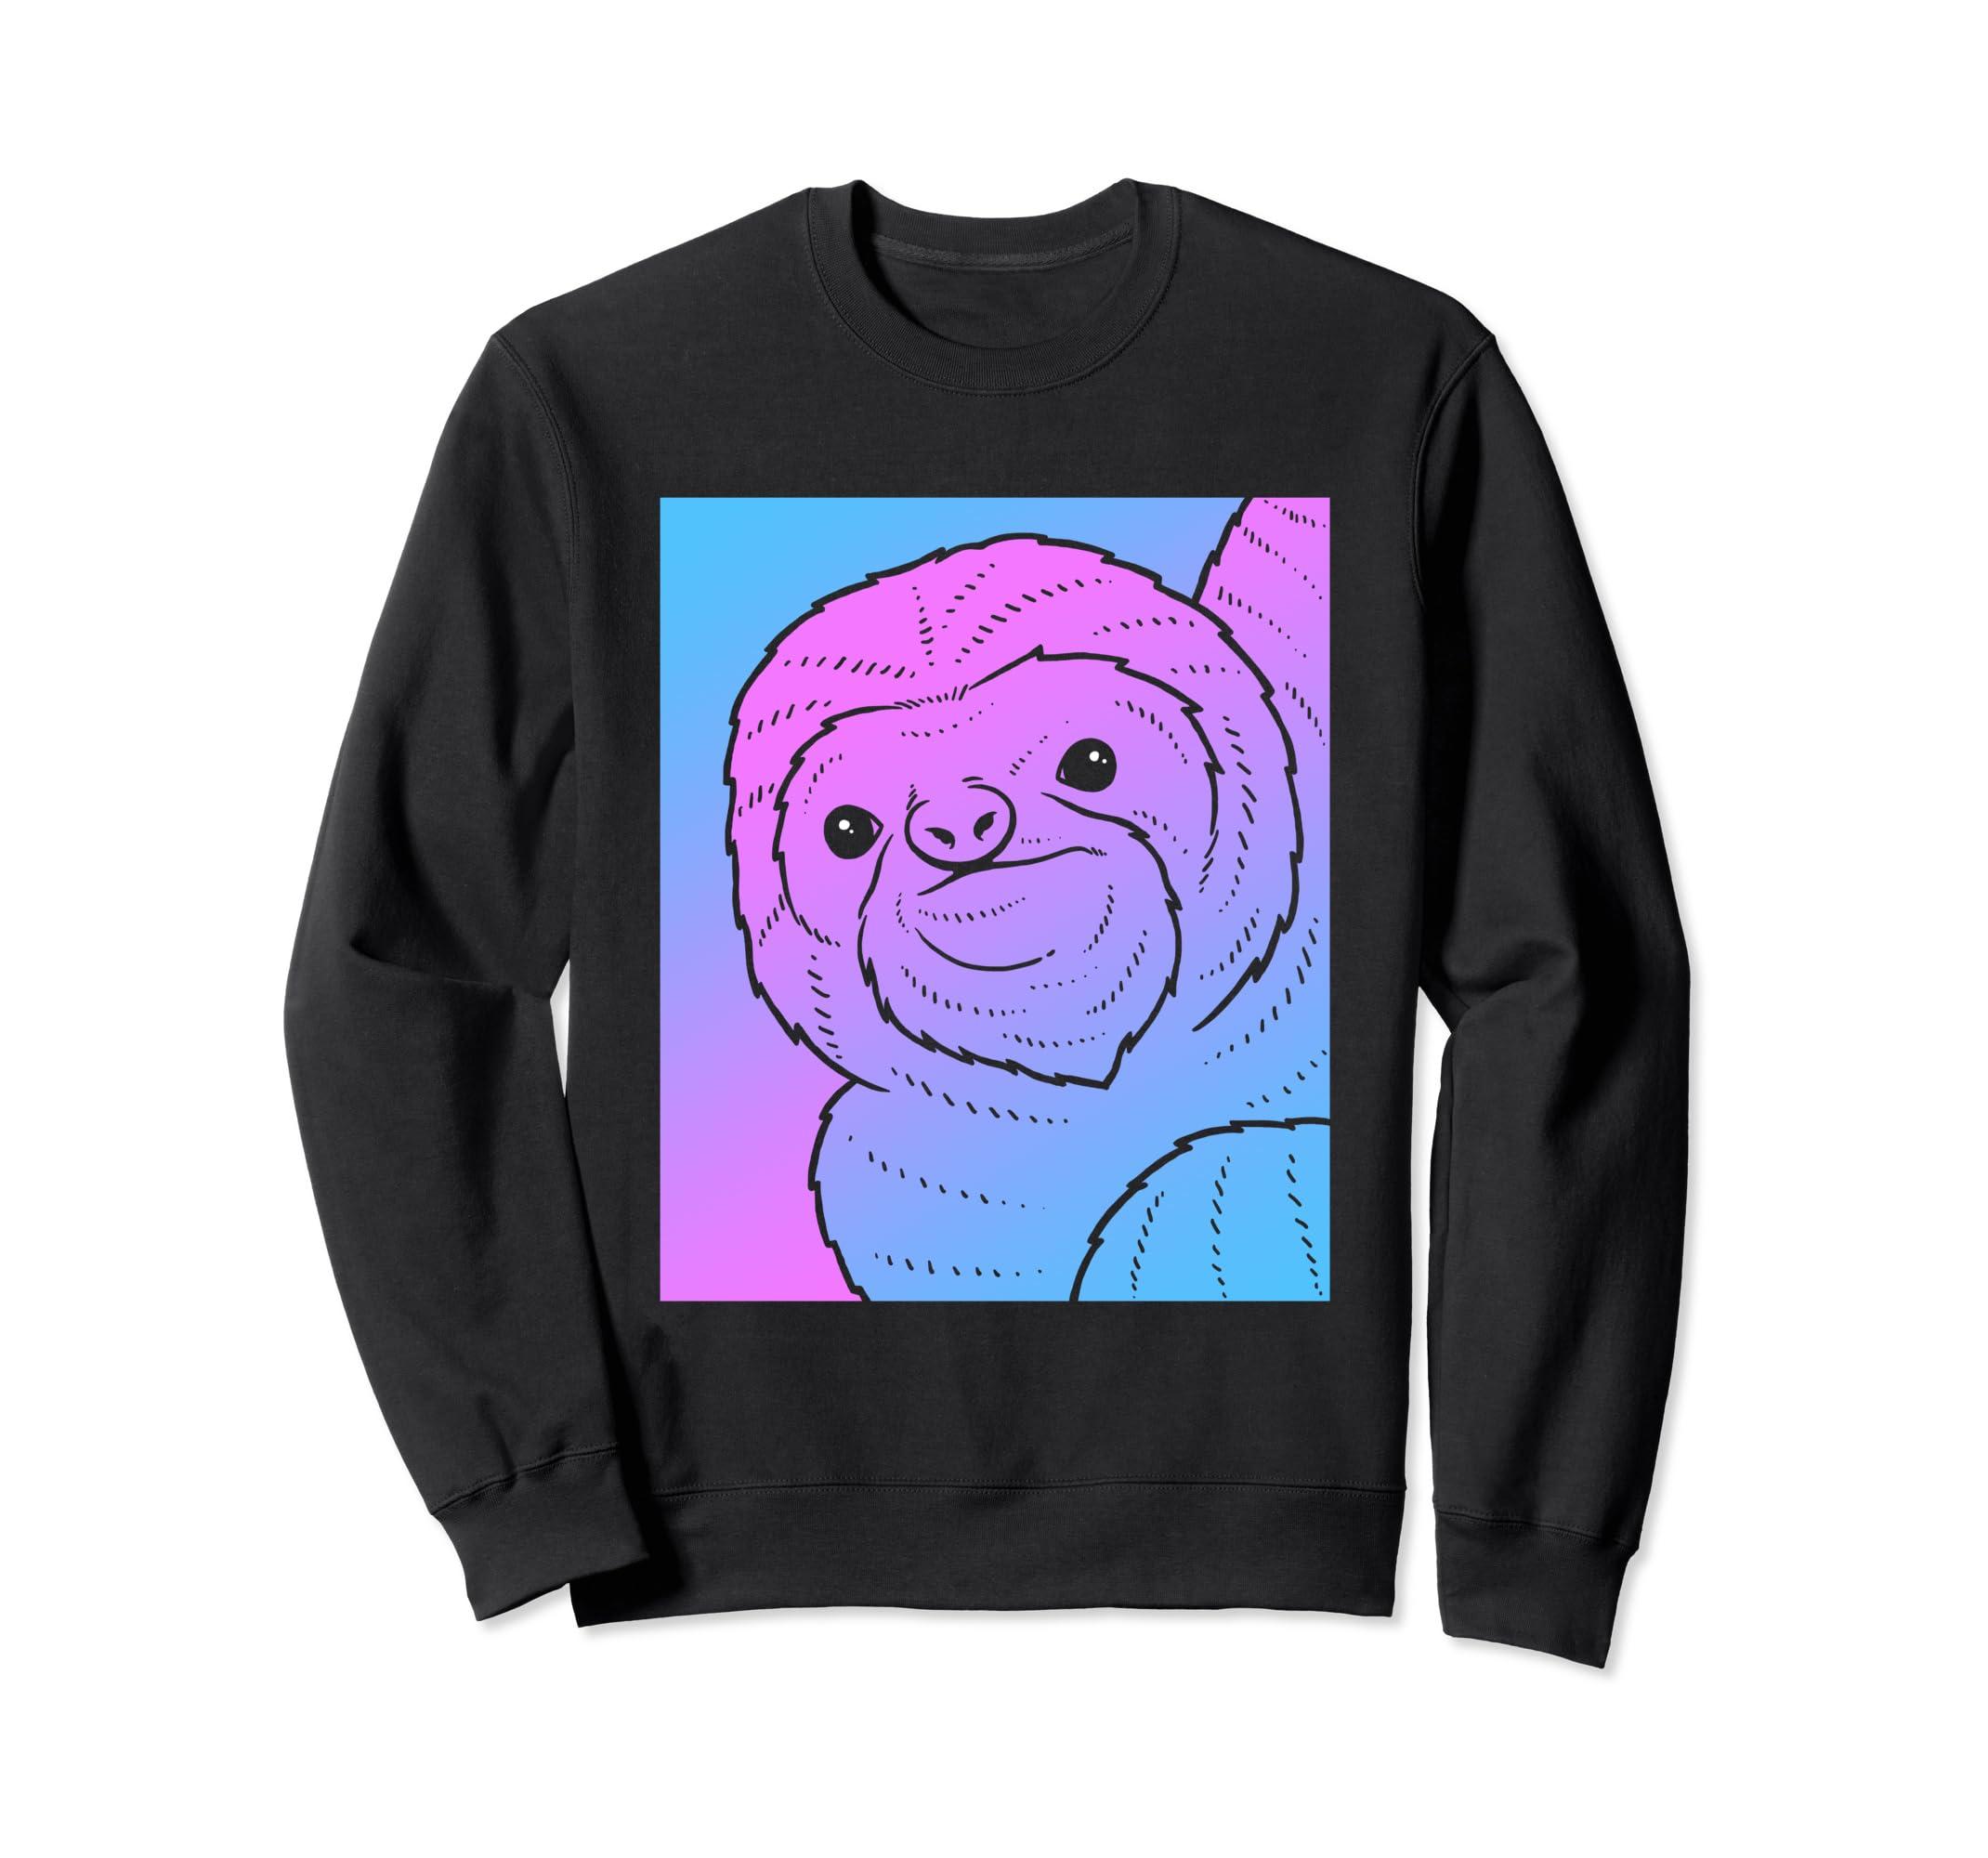 8b5d268bc Amazon.com: Vaporwave Sloth Aesthetic Sweatshirt - Pastel Sloths: Clothing